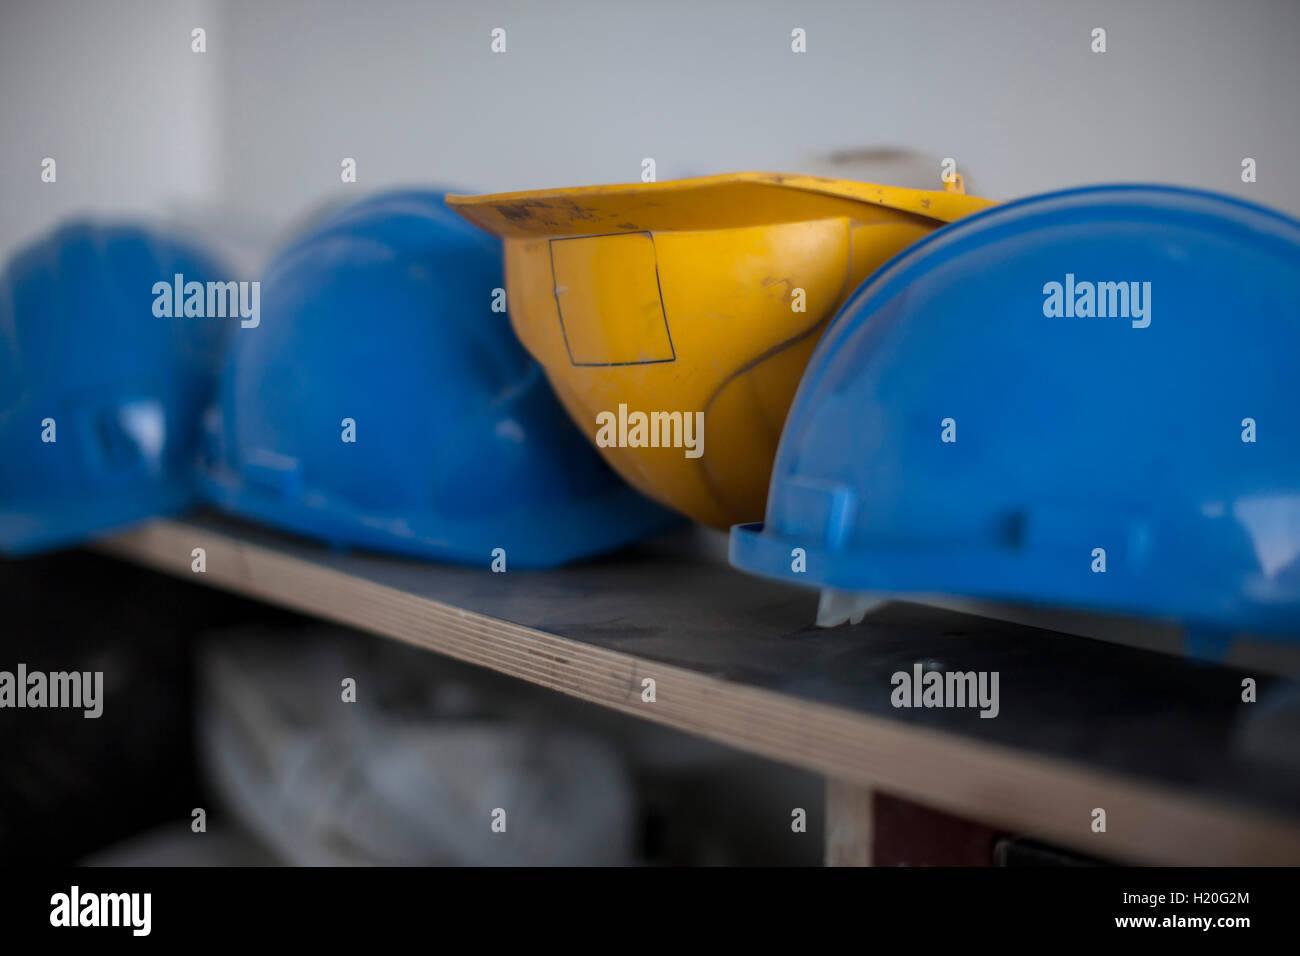 Hardhats on shelf - Stock Image